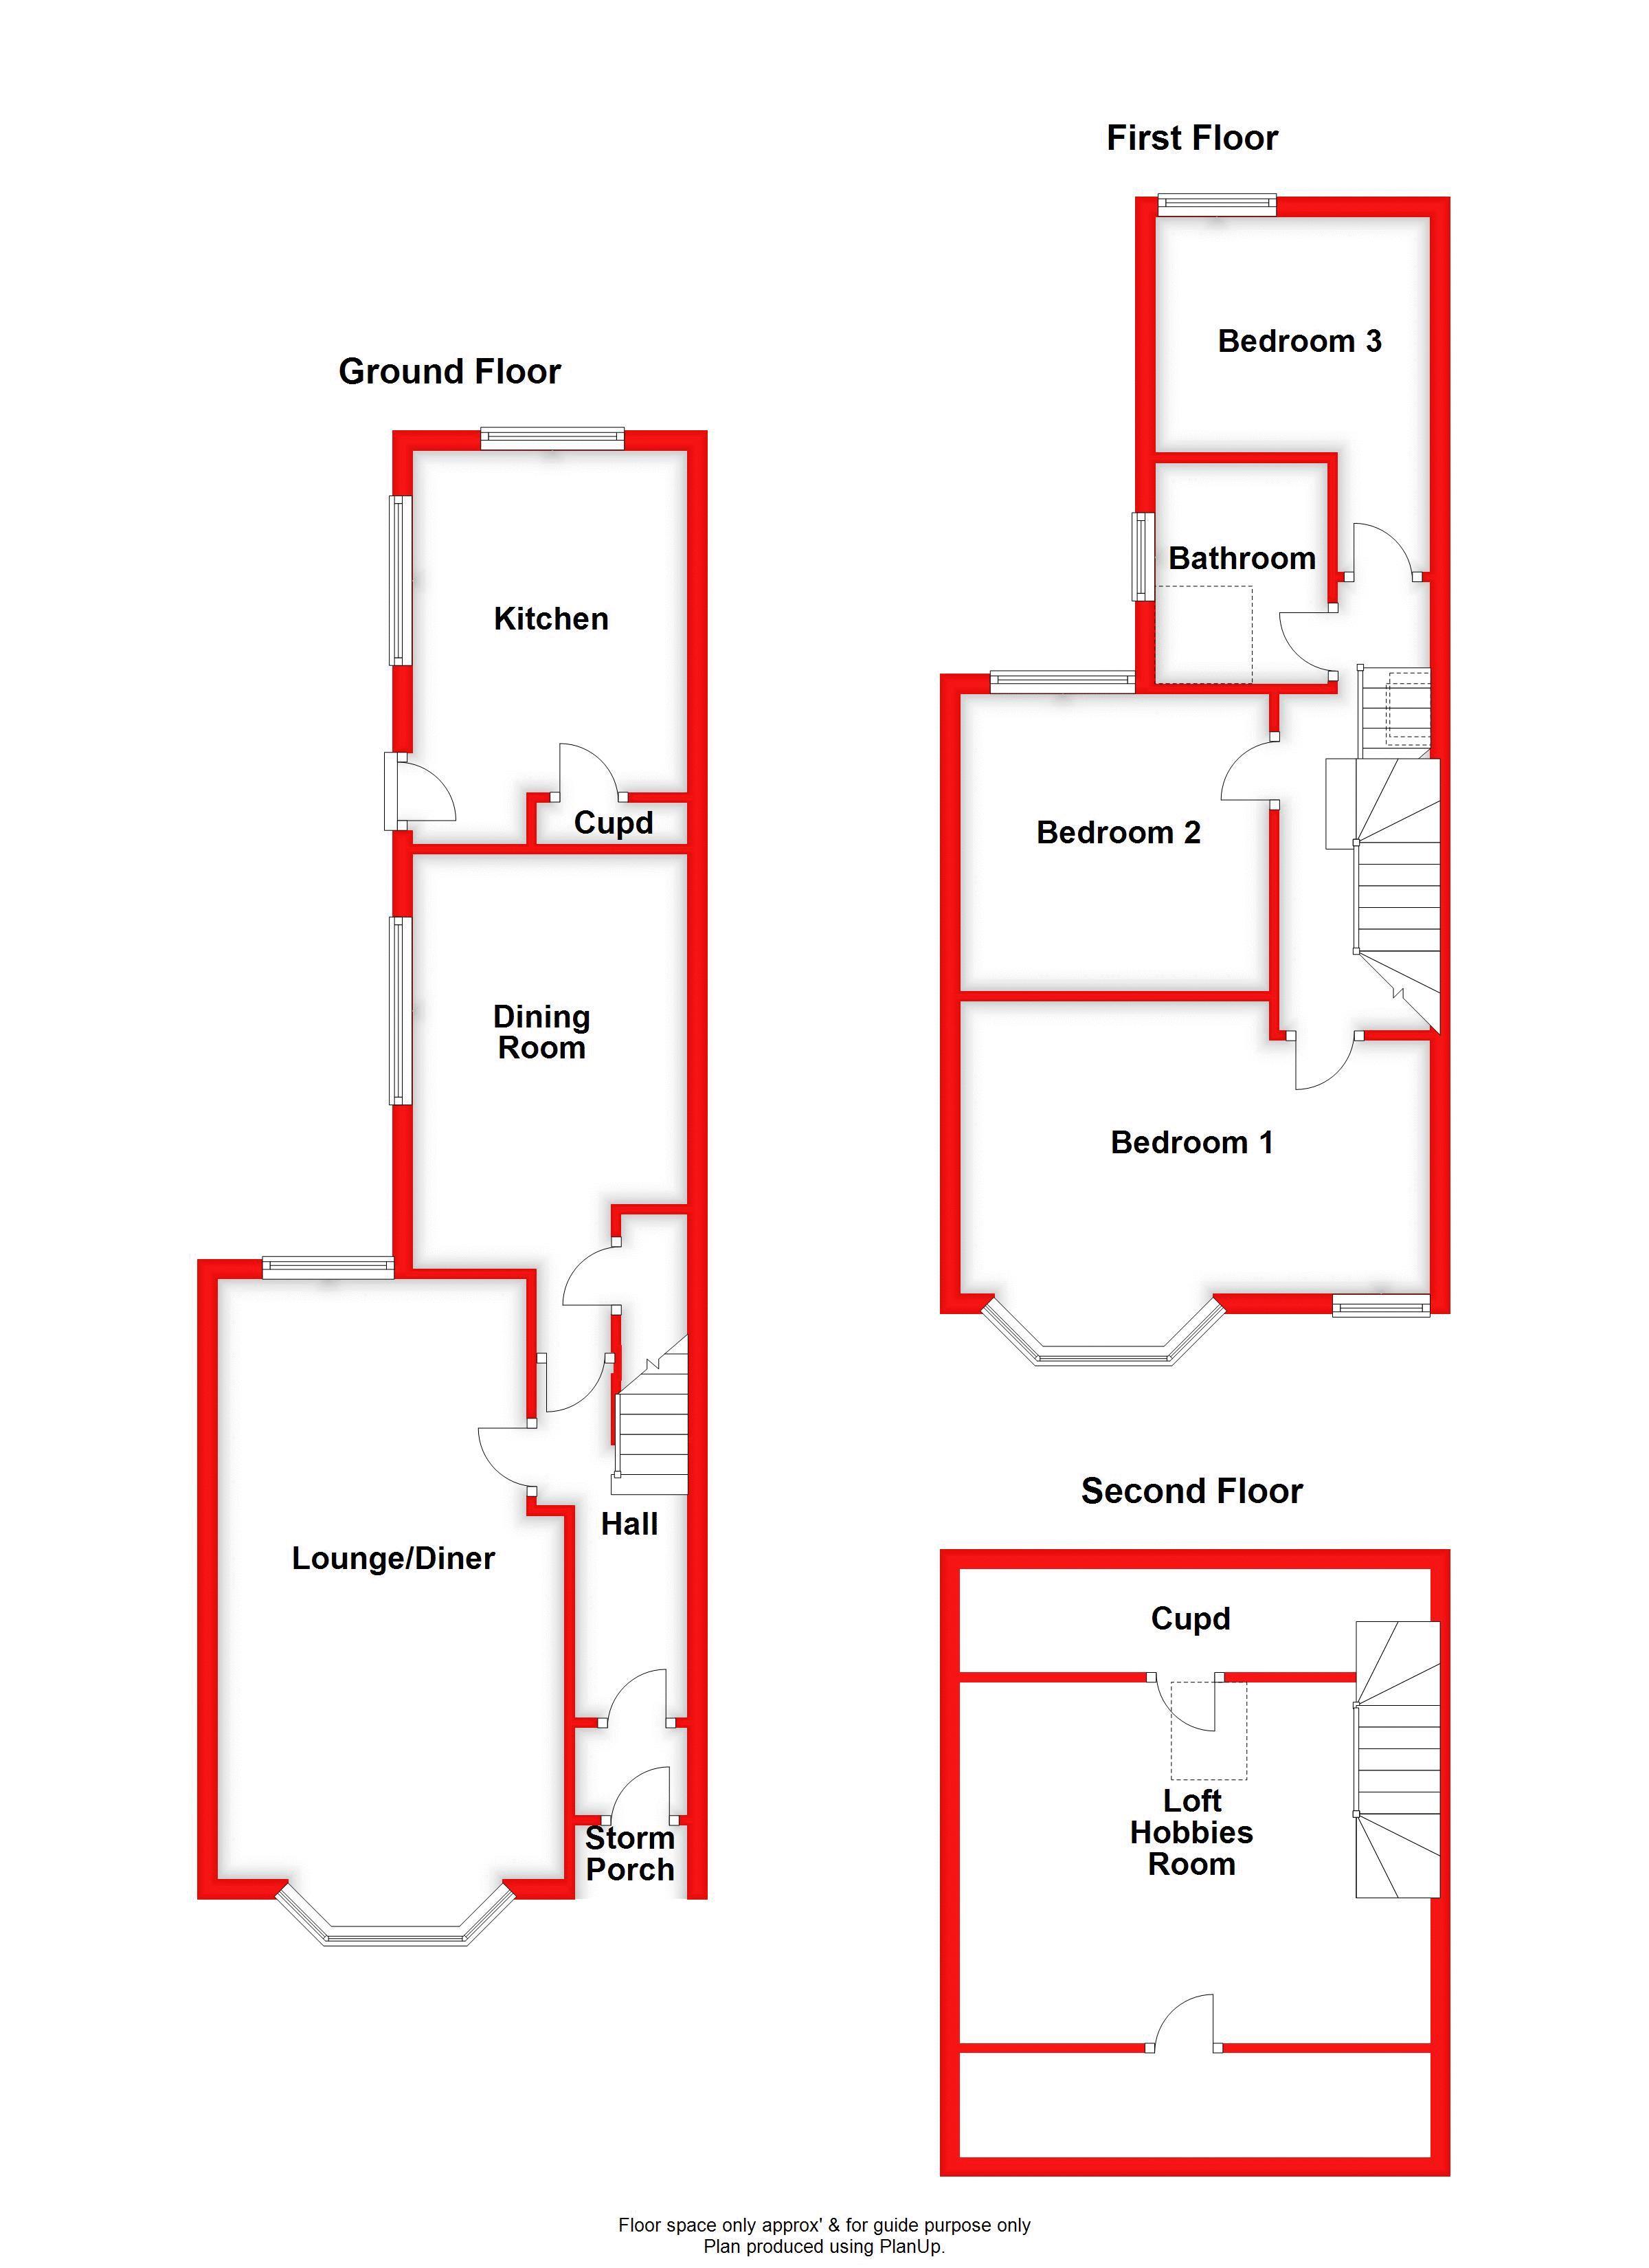 GROUND, 1ST & 2ND FLOORS